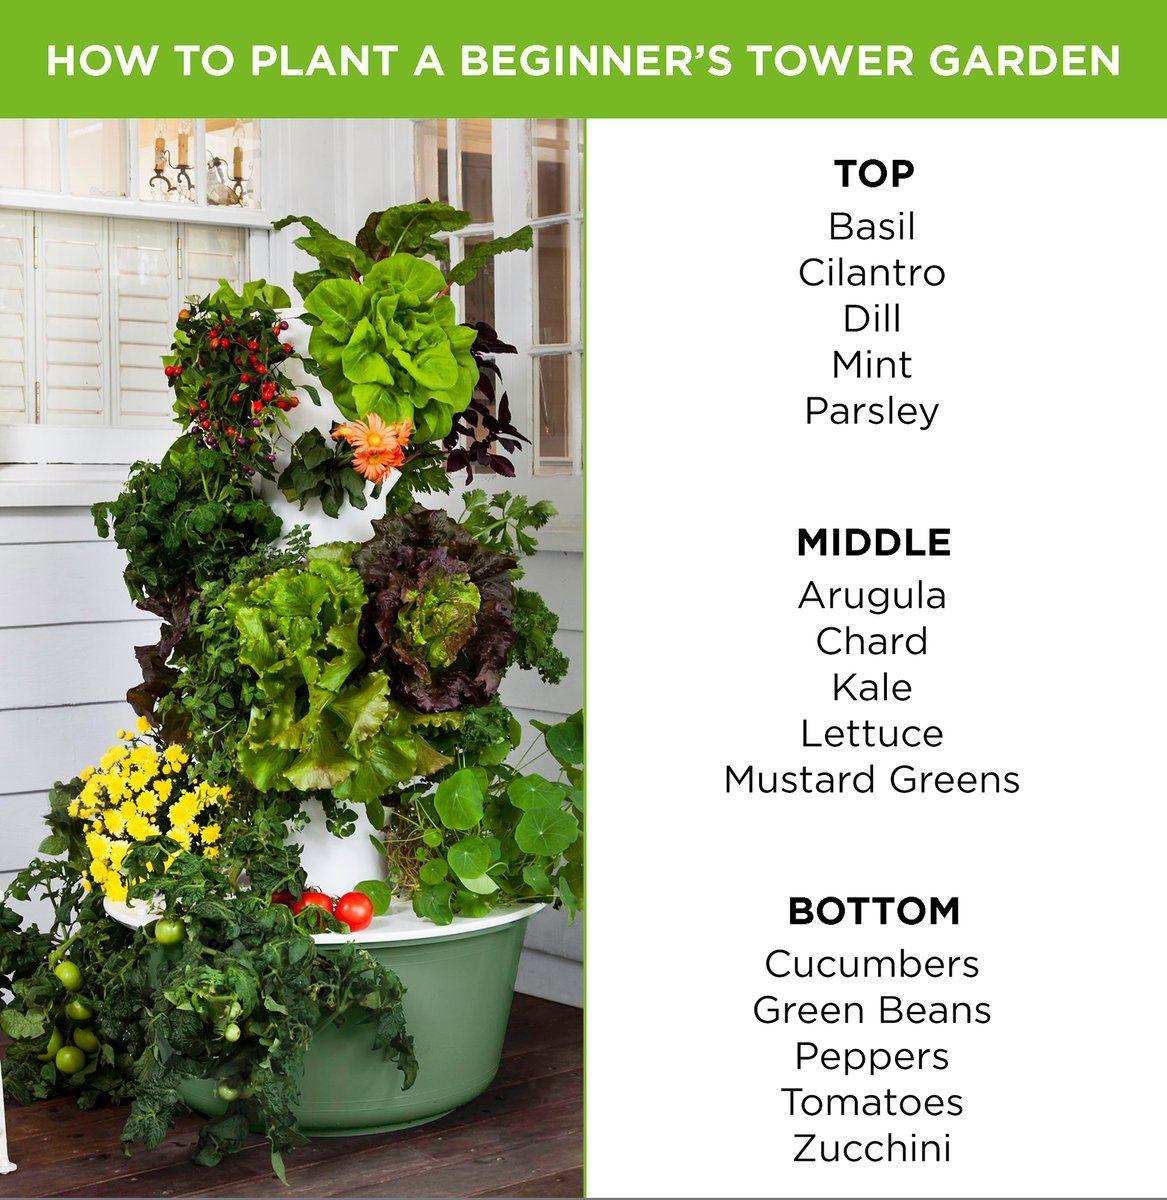 Thetowergarden Yourtowergarden Juice Plus Tower Garden Tower Garden Plants